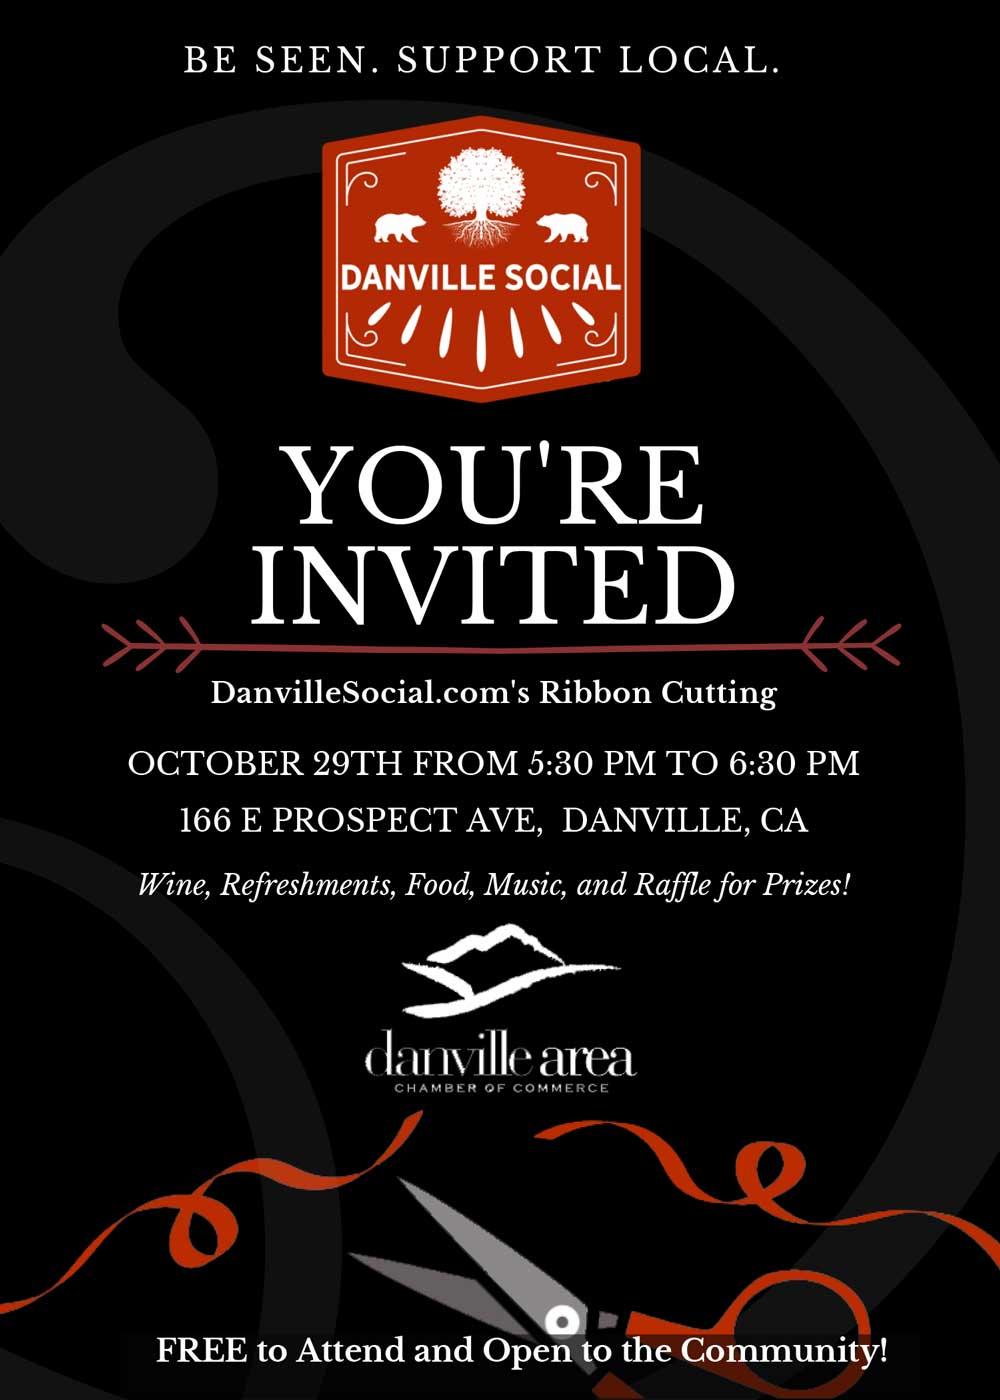 DanvilleSocial.com Chamber of Commerce Ribbon Cutting